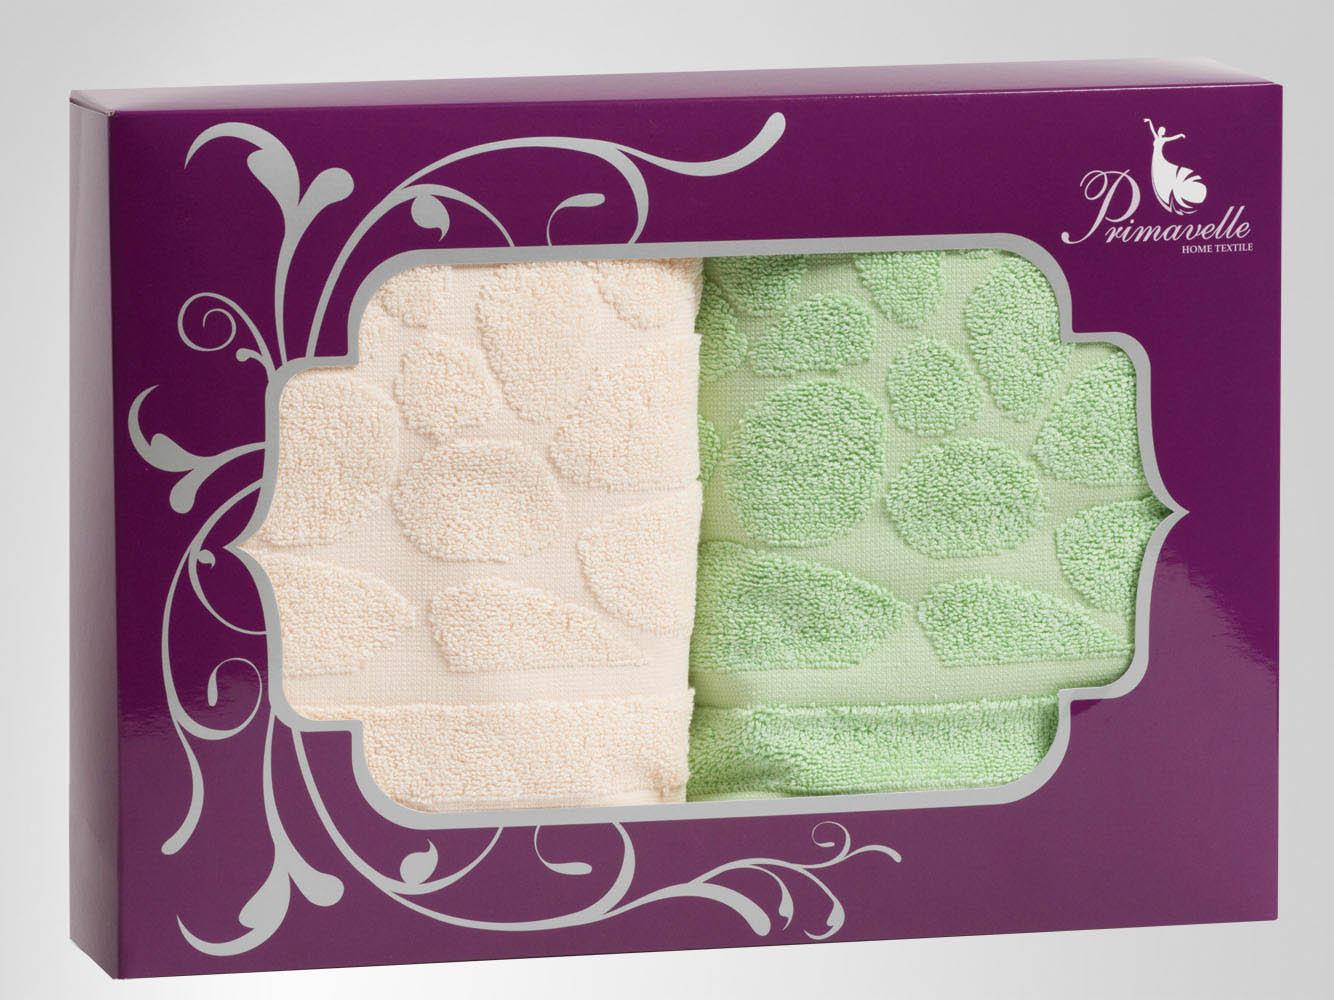 Полотенца Primavelle Полотенце Piera Цвет: Зеленый+Бежевый (50х90 см - 2 шт) цена и фото